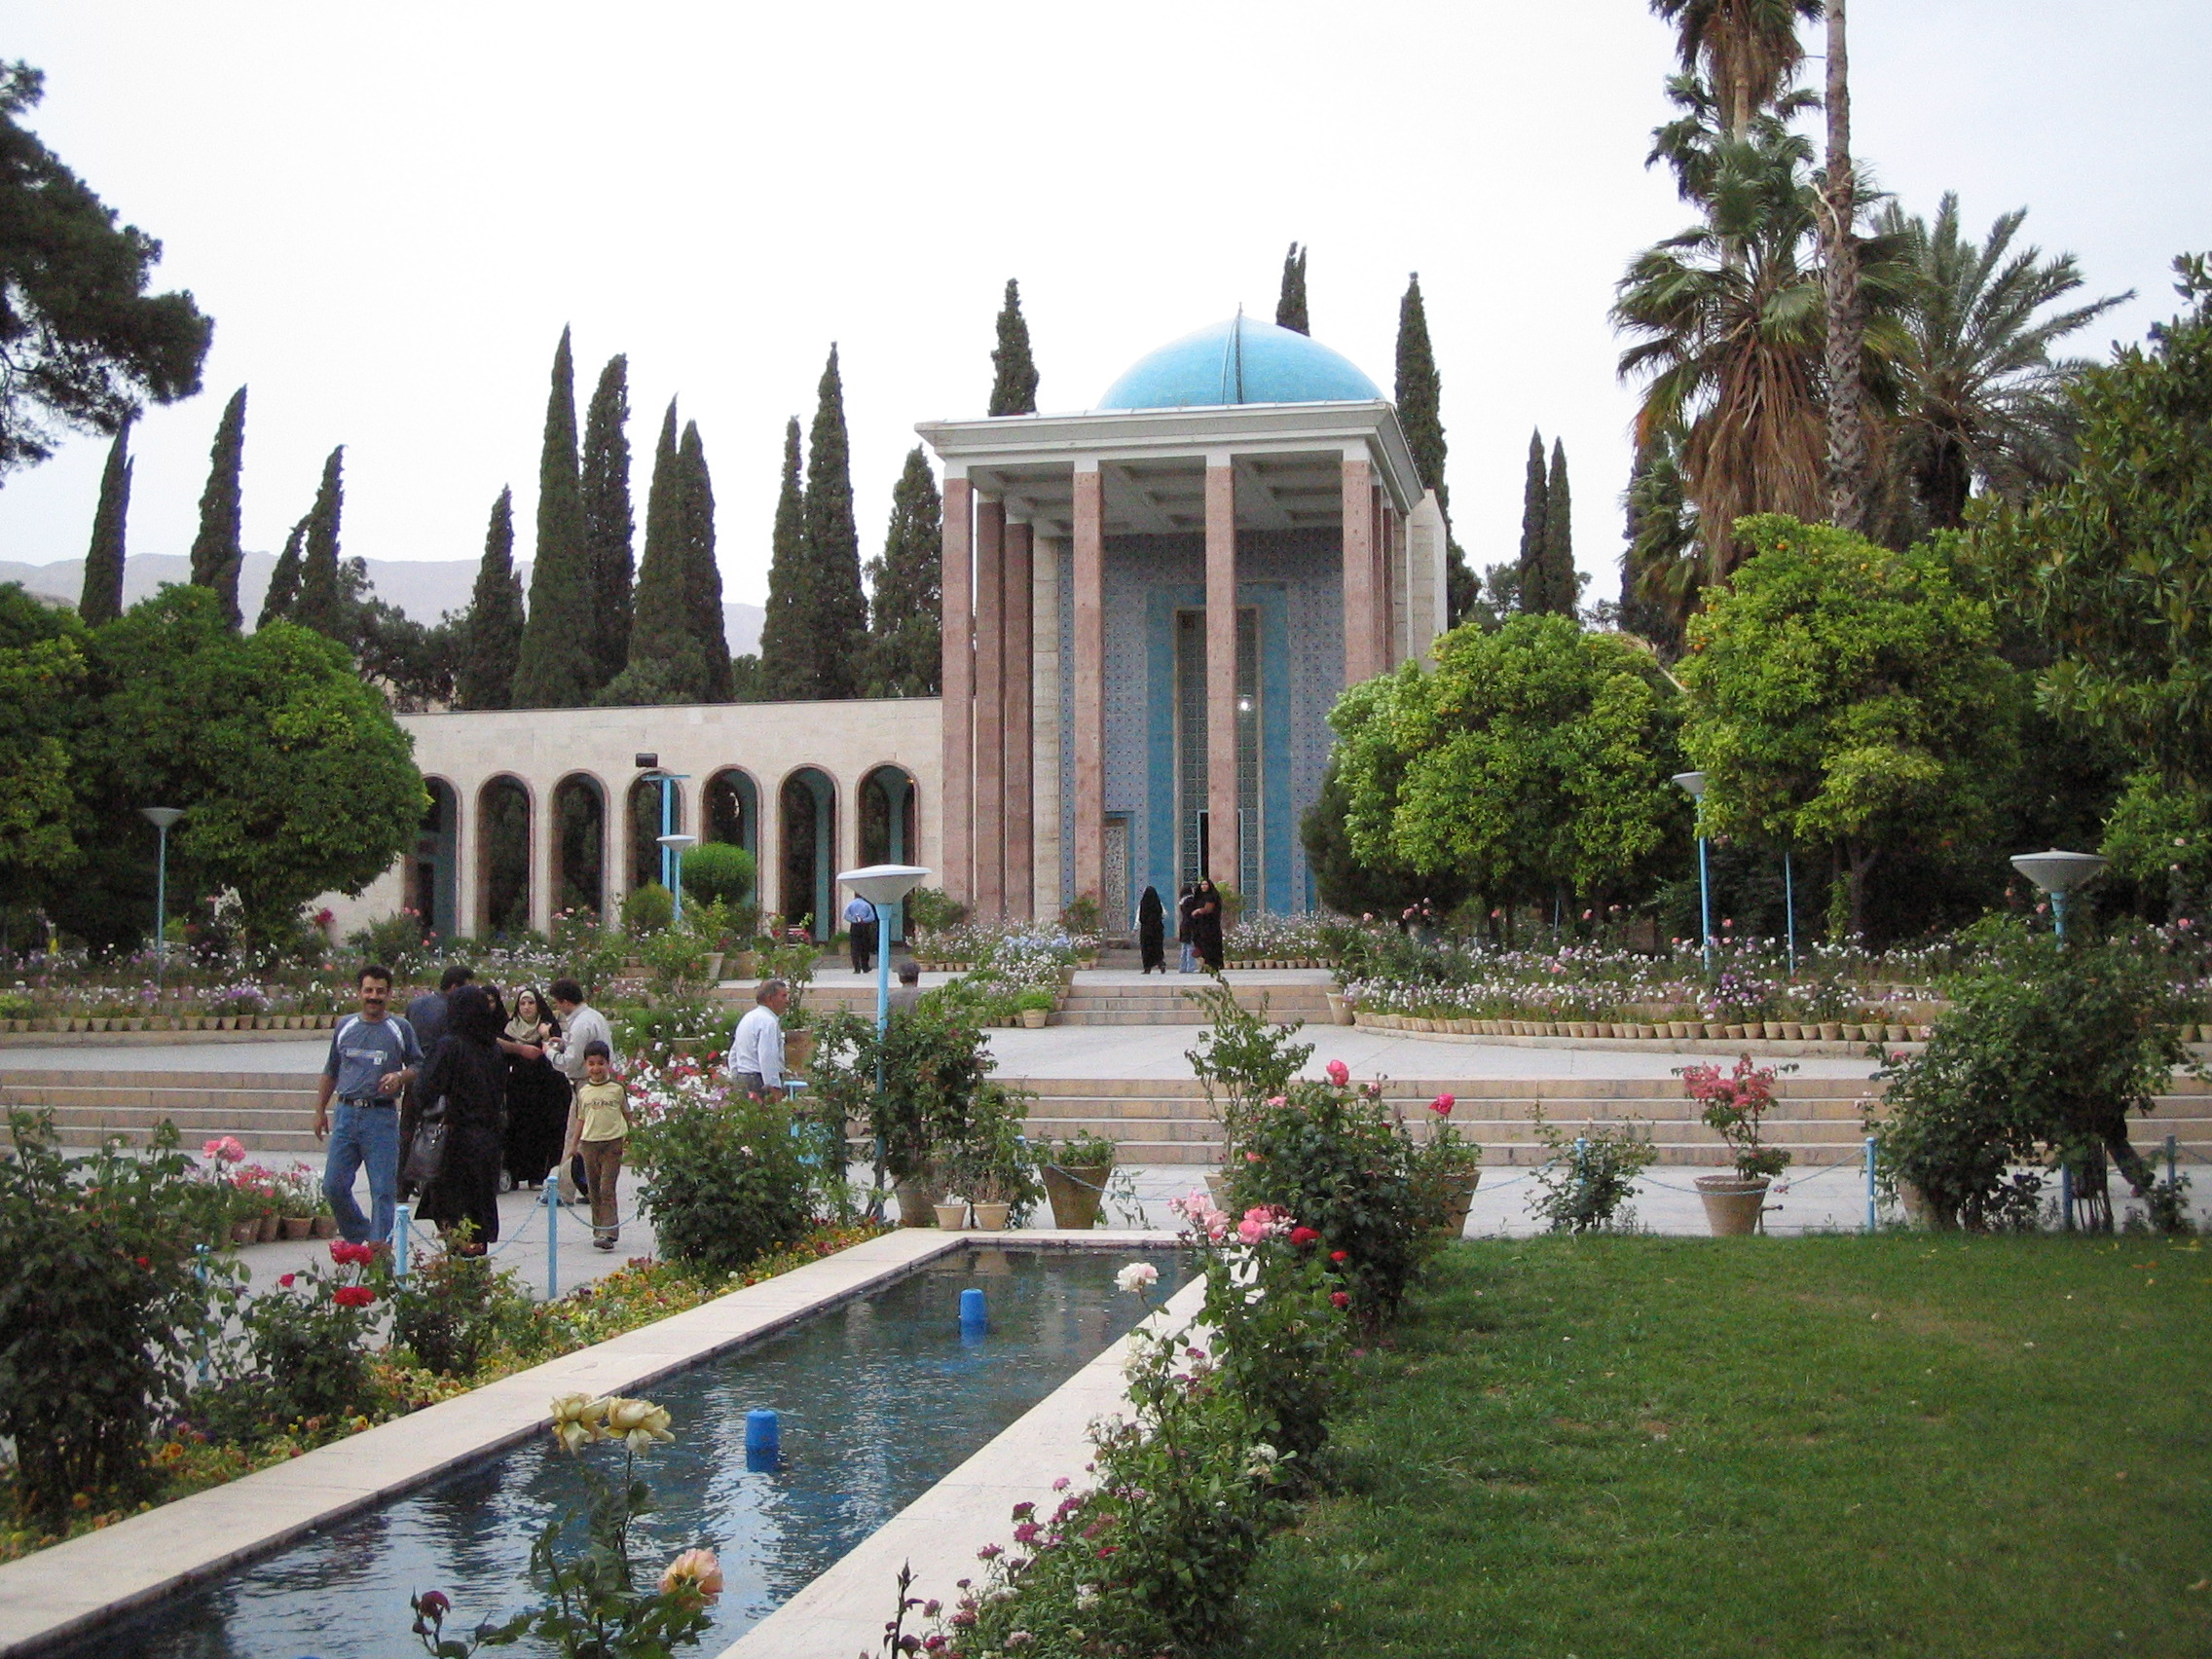 File:Aramgah-e-saadi shiraz.jpg - Wikimedia Commons